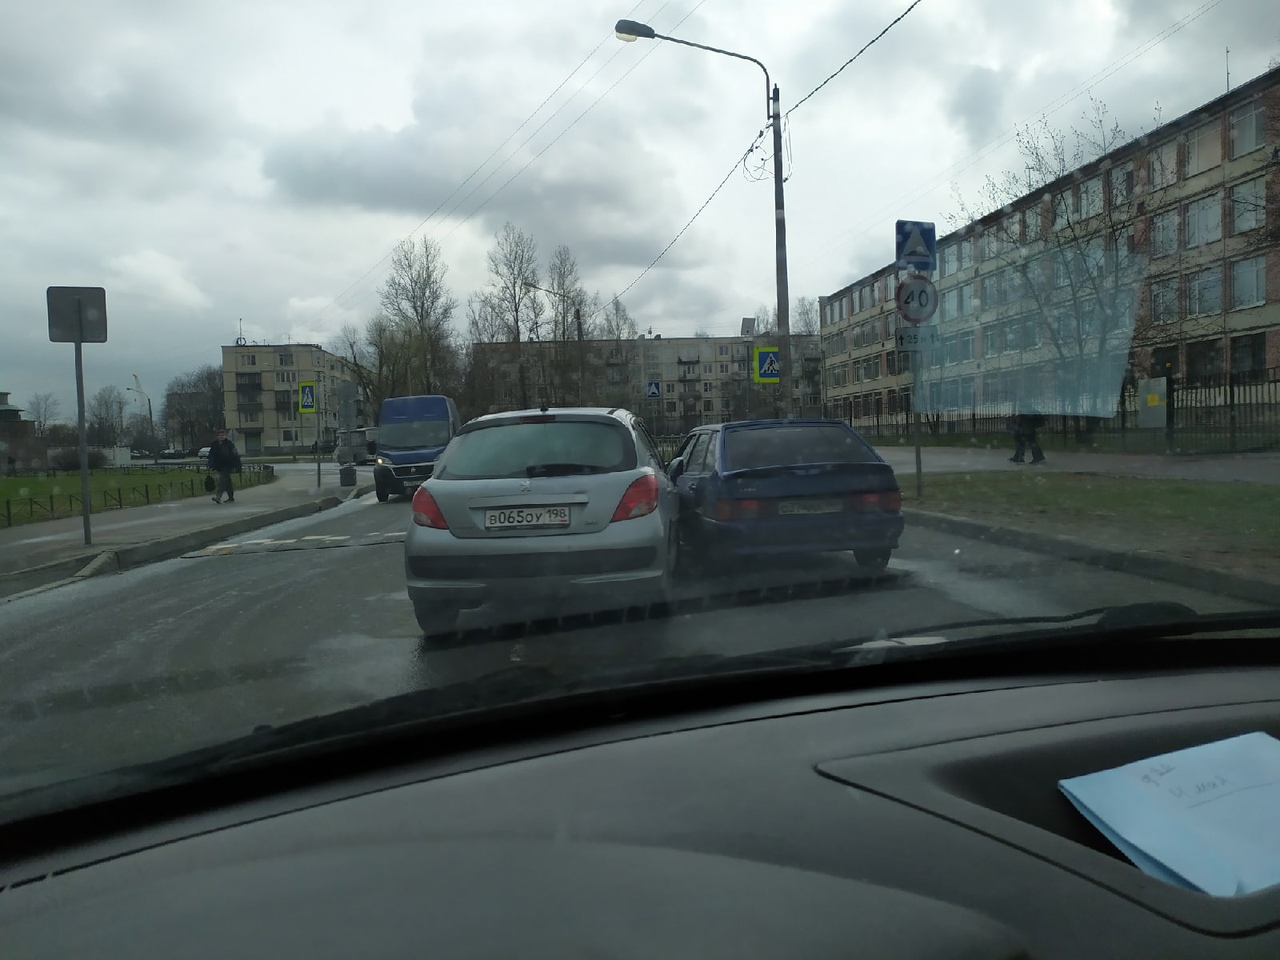 Peugeot и Лада столкнулись на Авангардной по пути в Лигово у 237 школы.